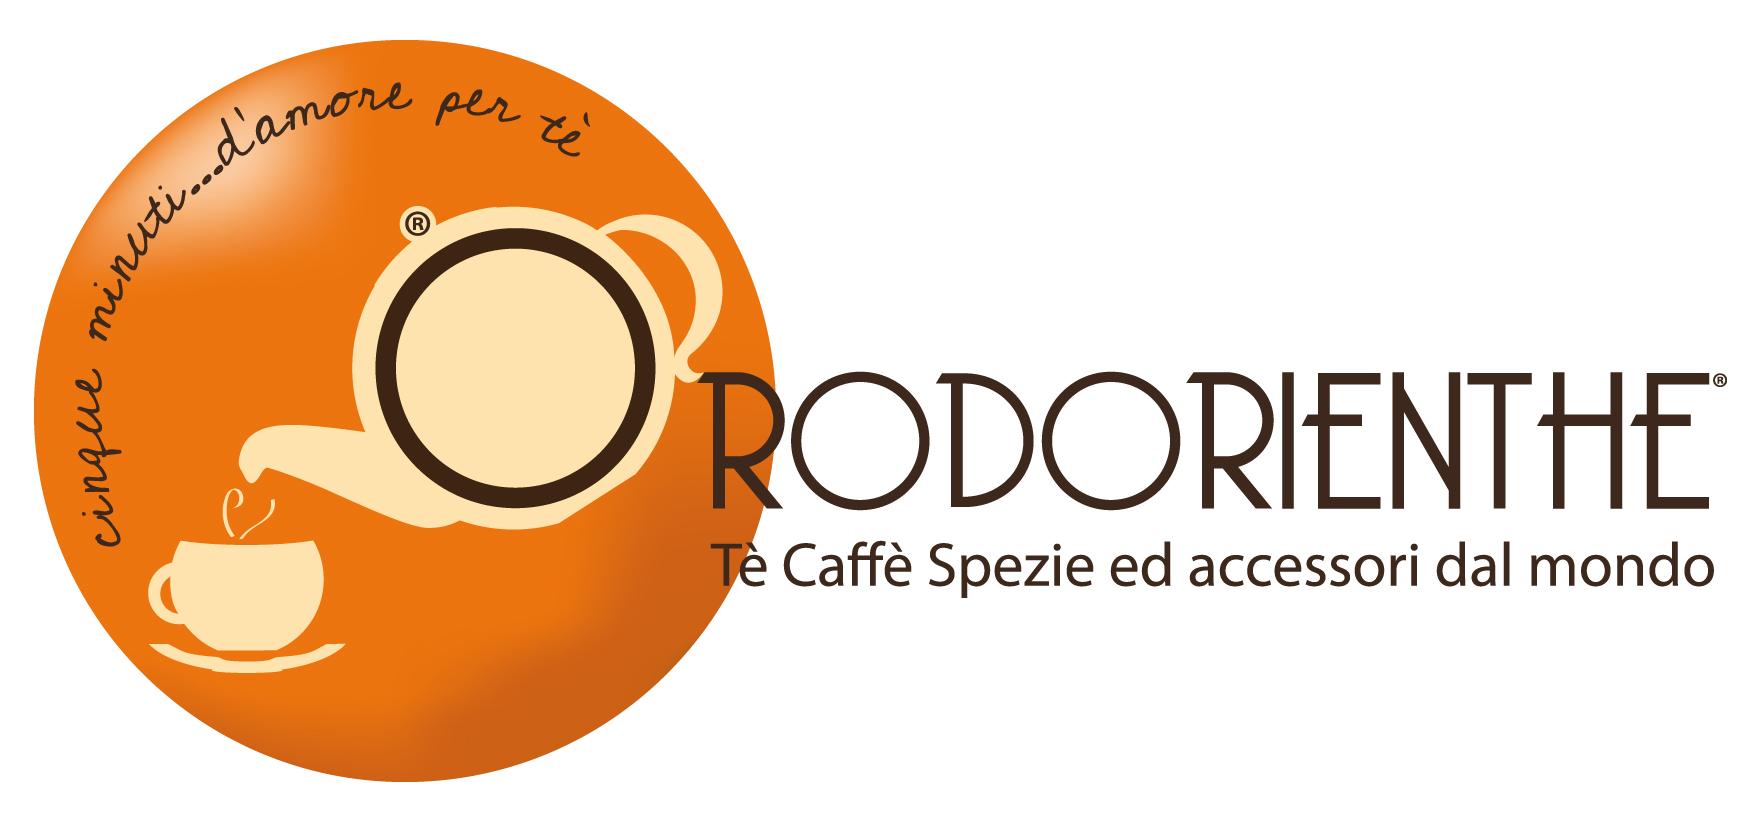 orodorienthe logo RGB